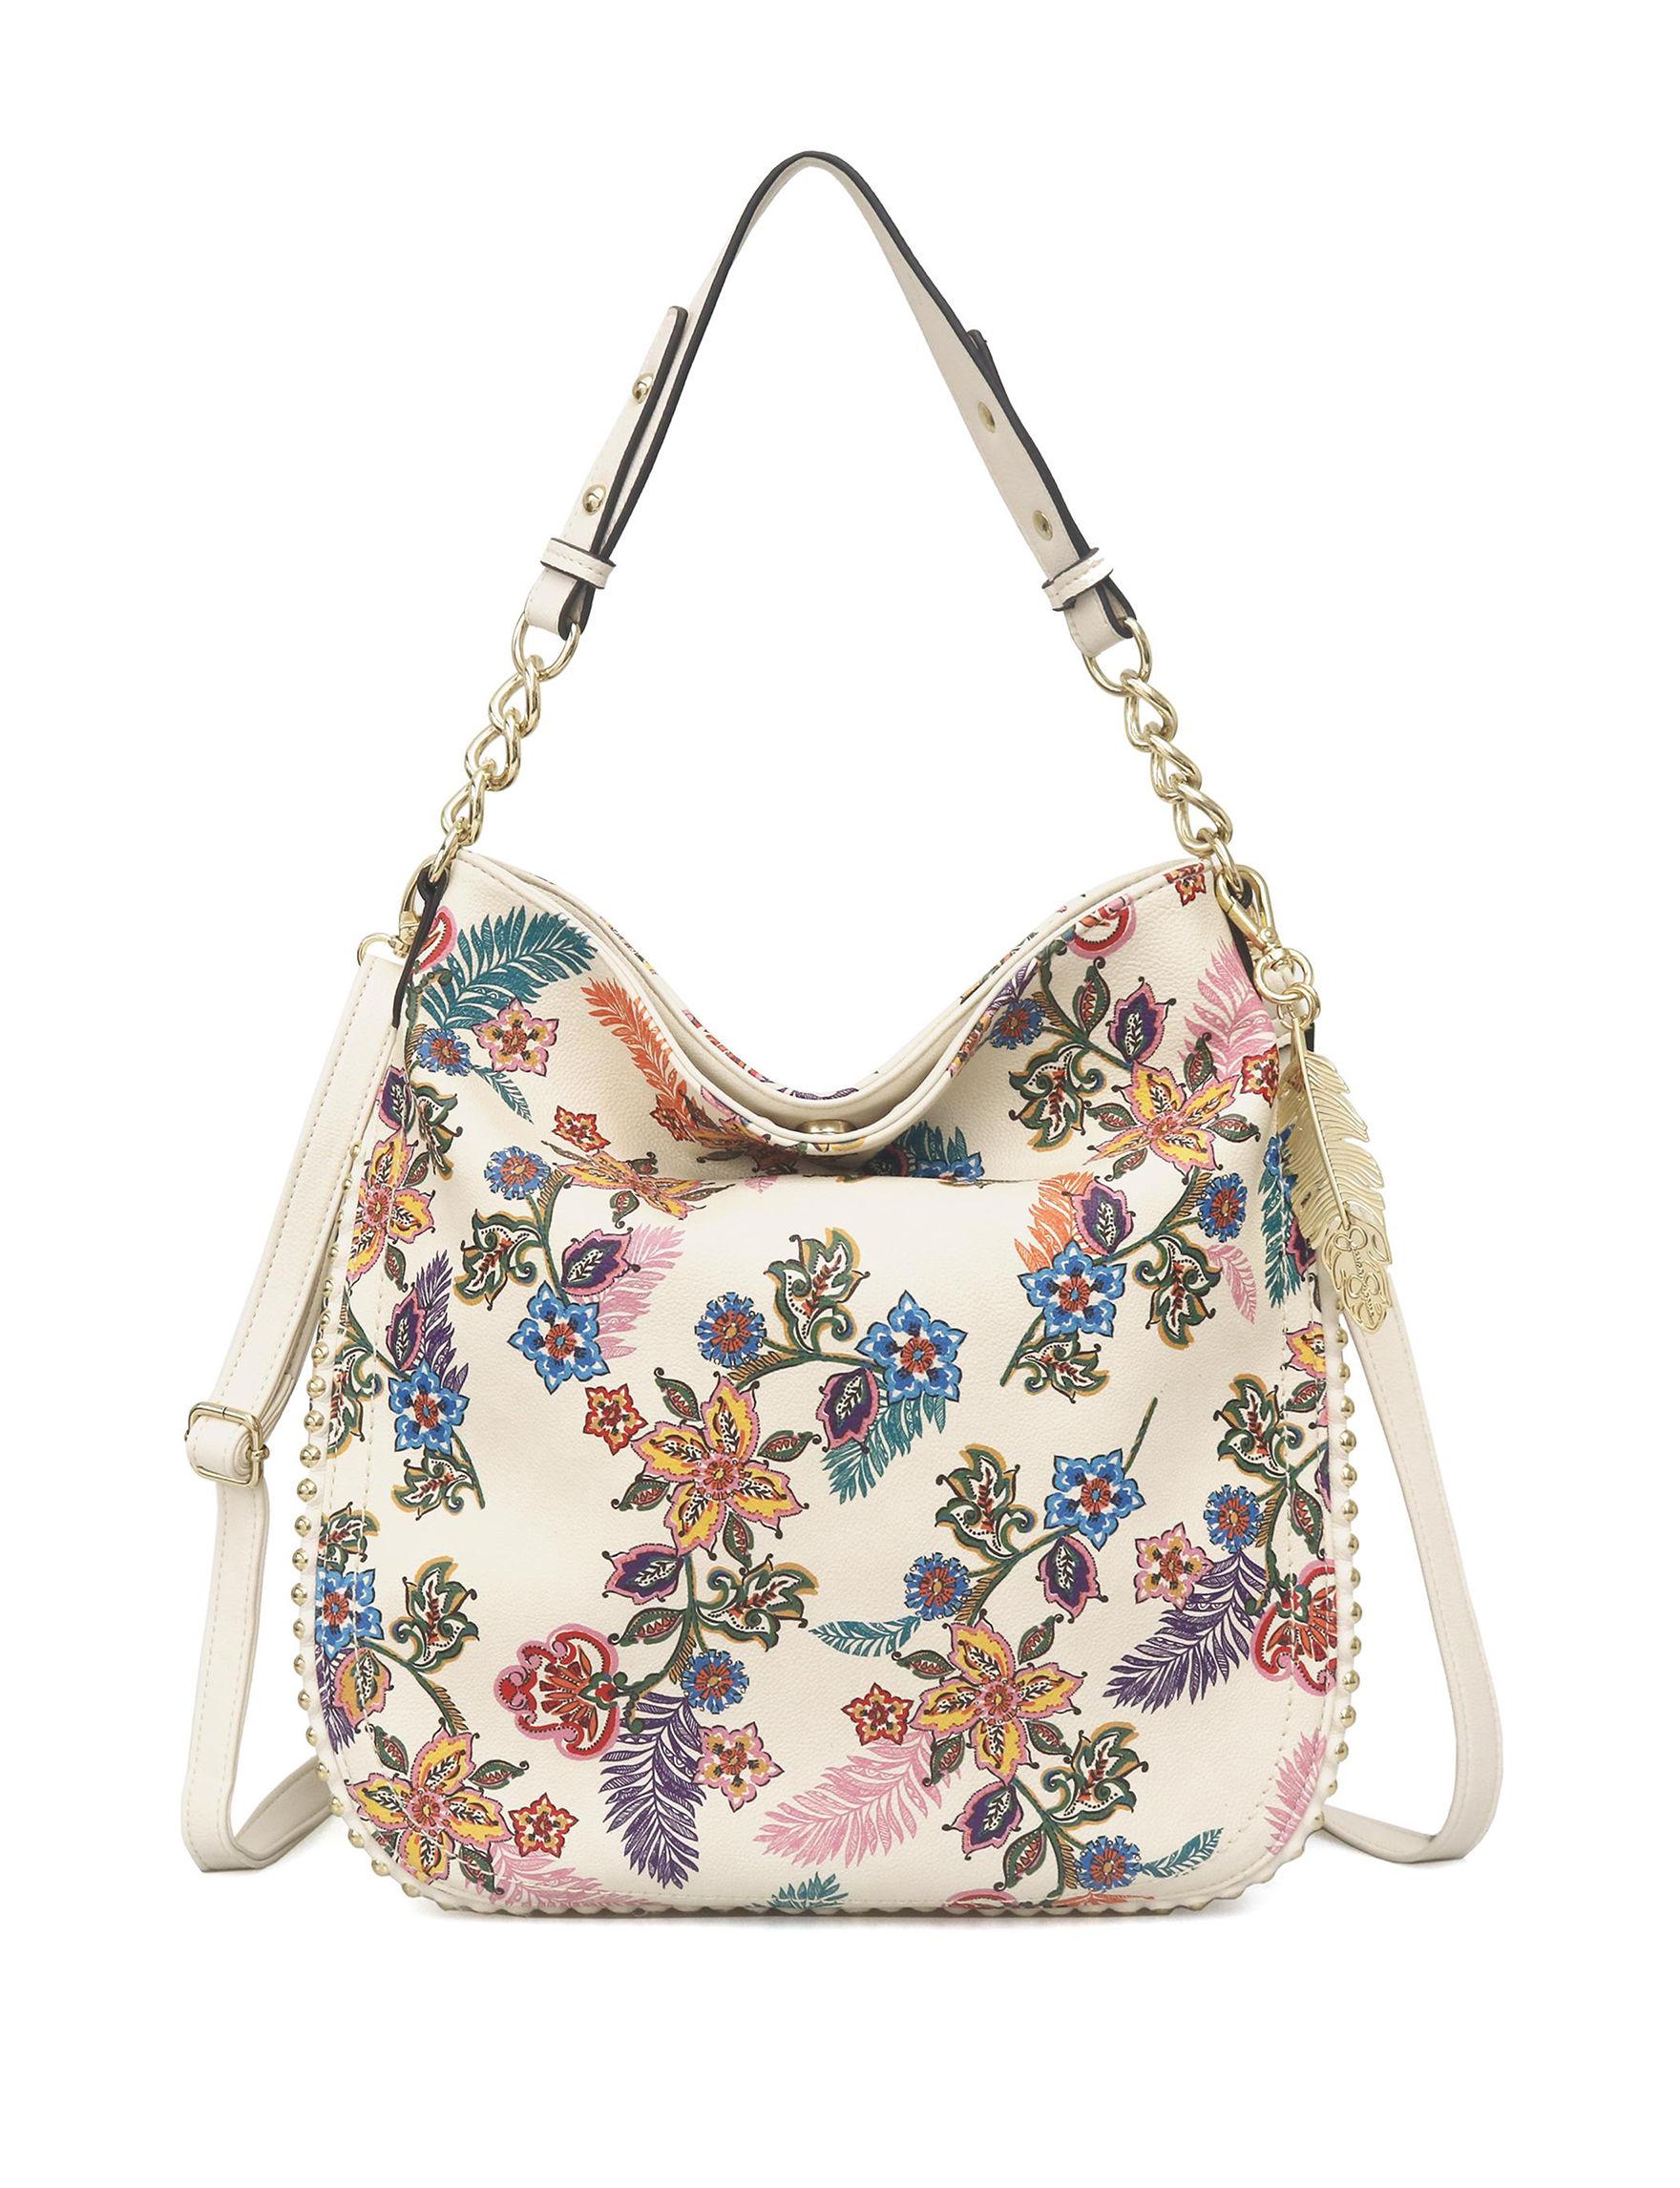 Jessica Simpson White Floral